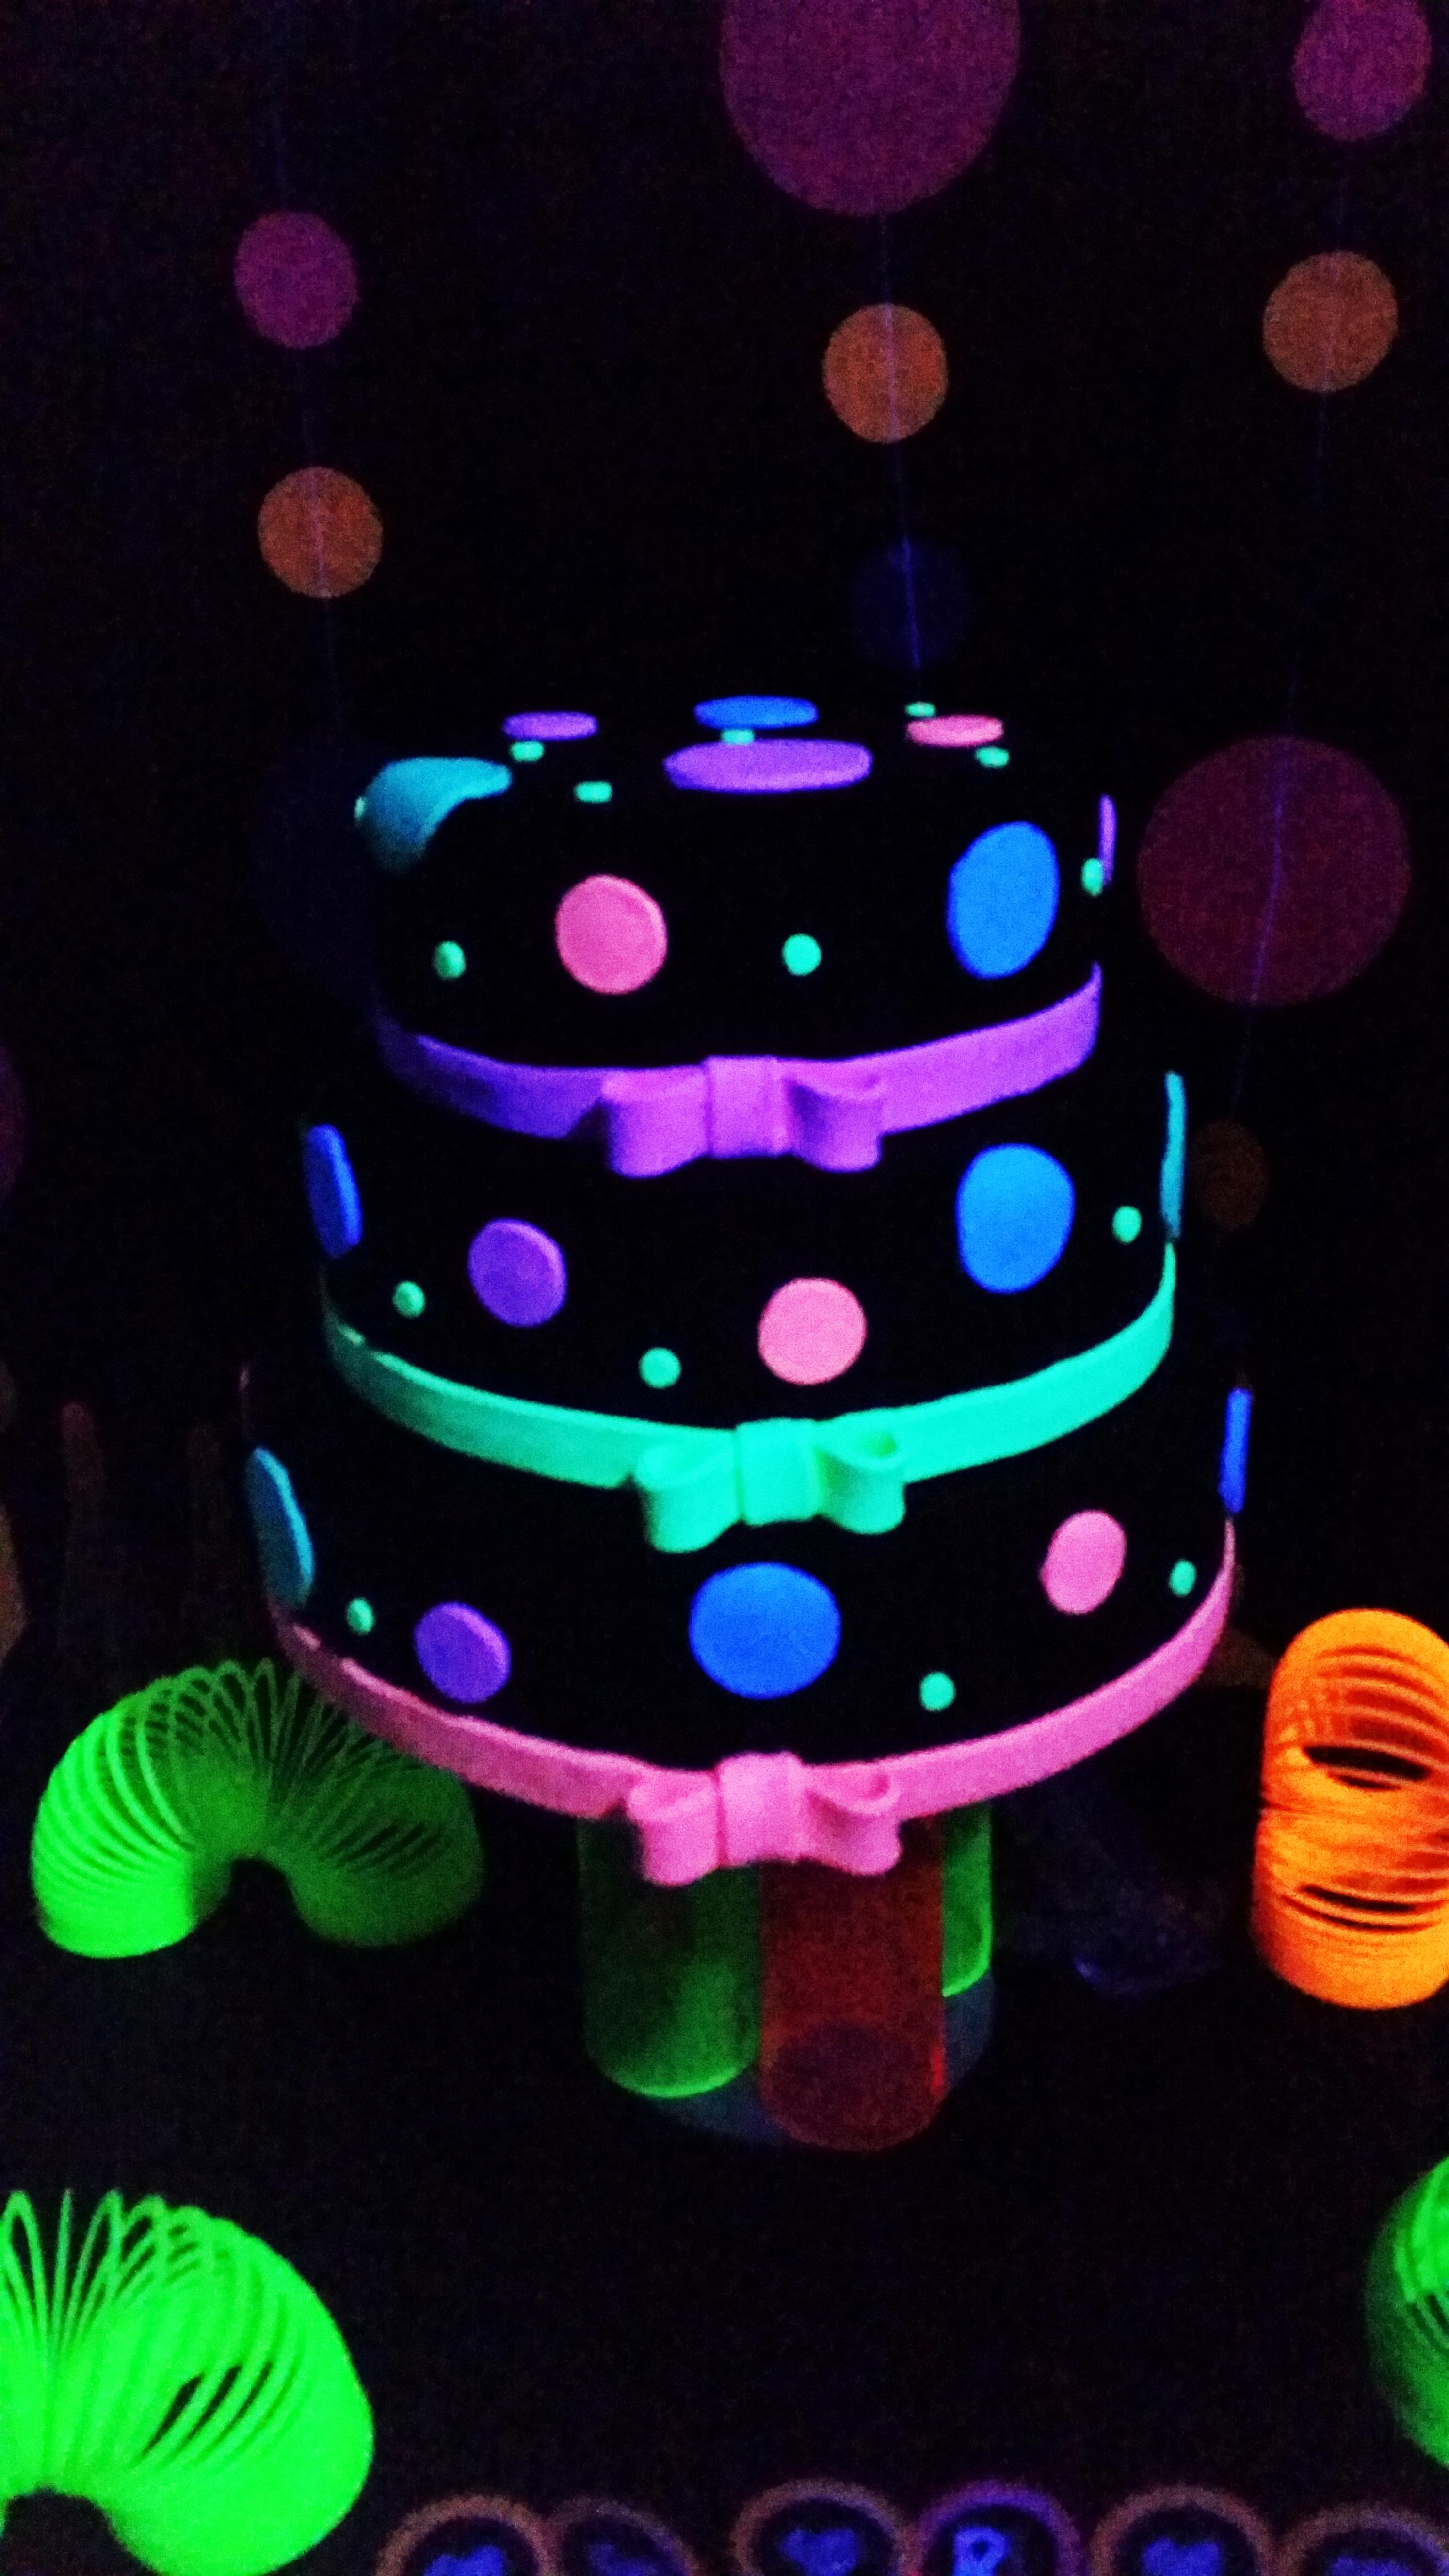 Fake Childrens Birthday Cake